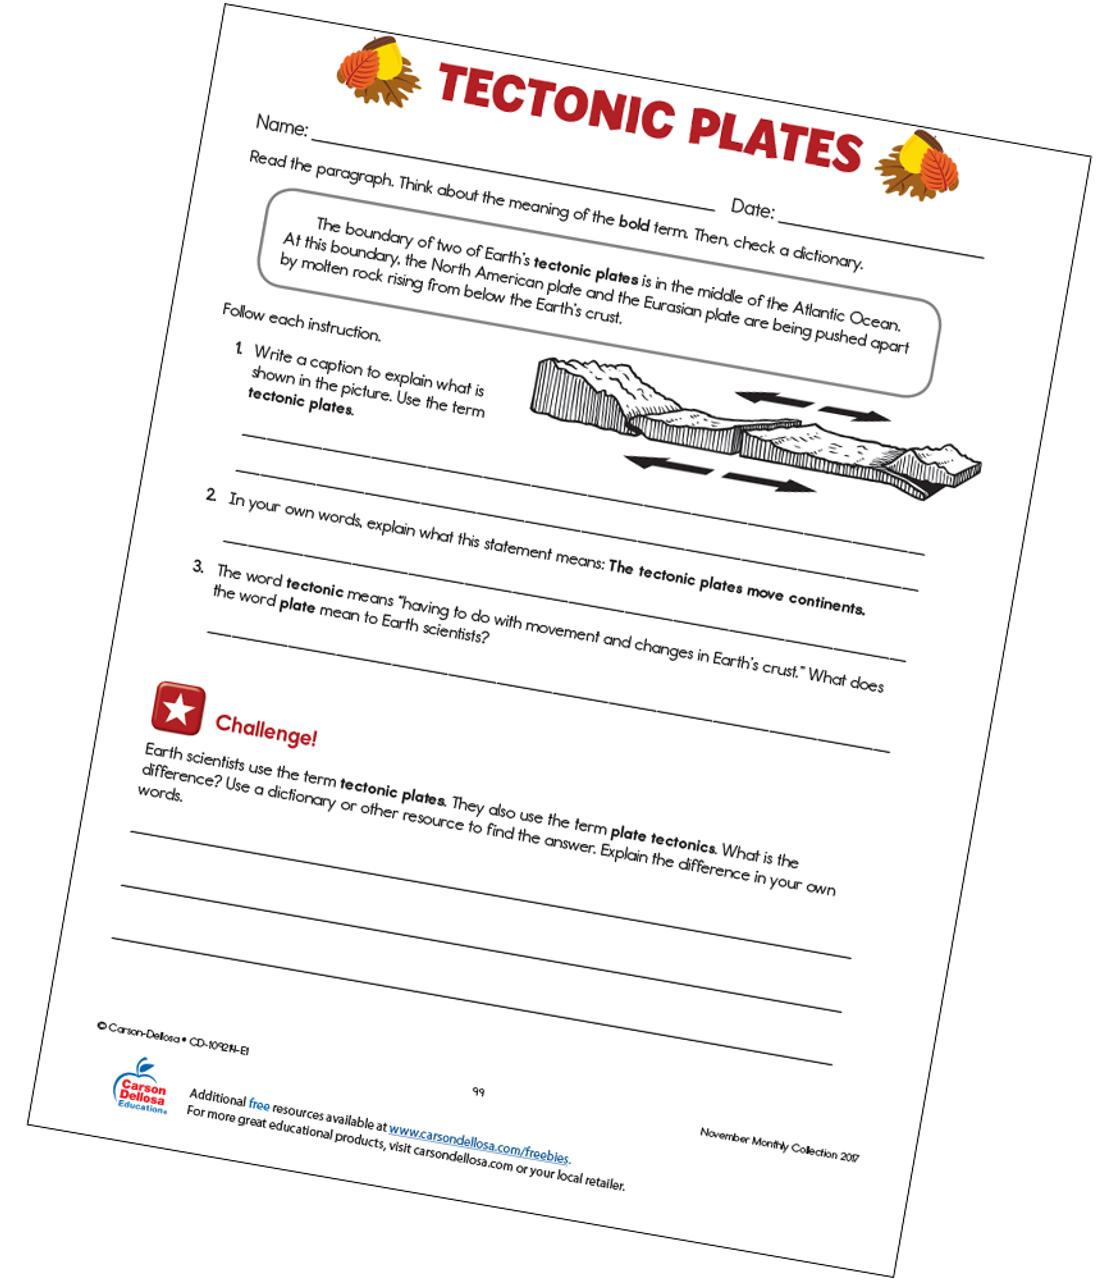 Tectonic Plates Free Printable | Carson Dellosa